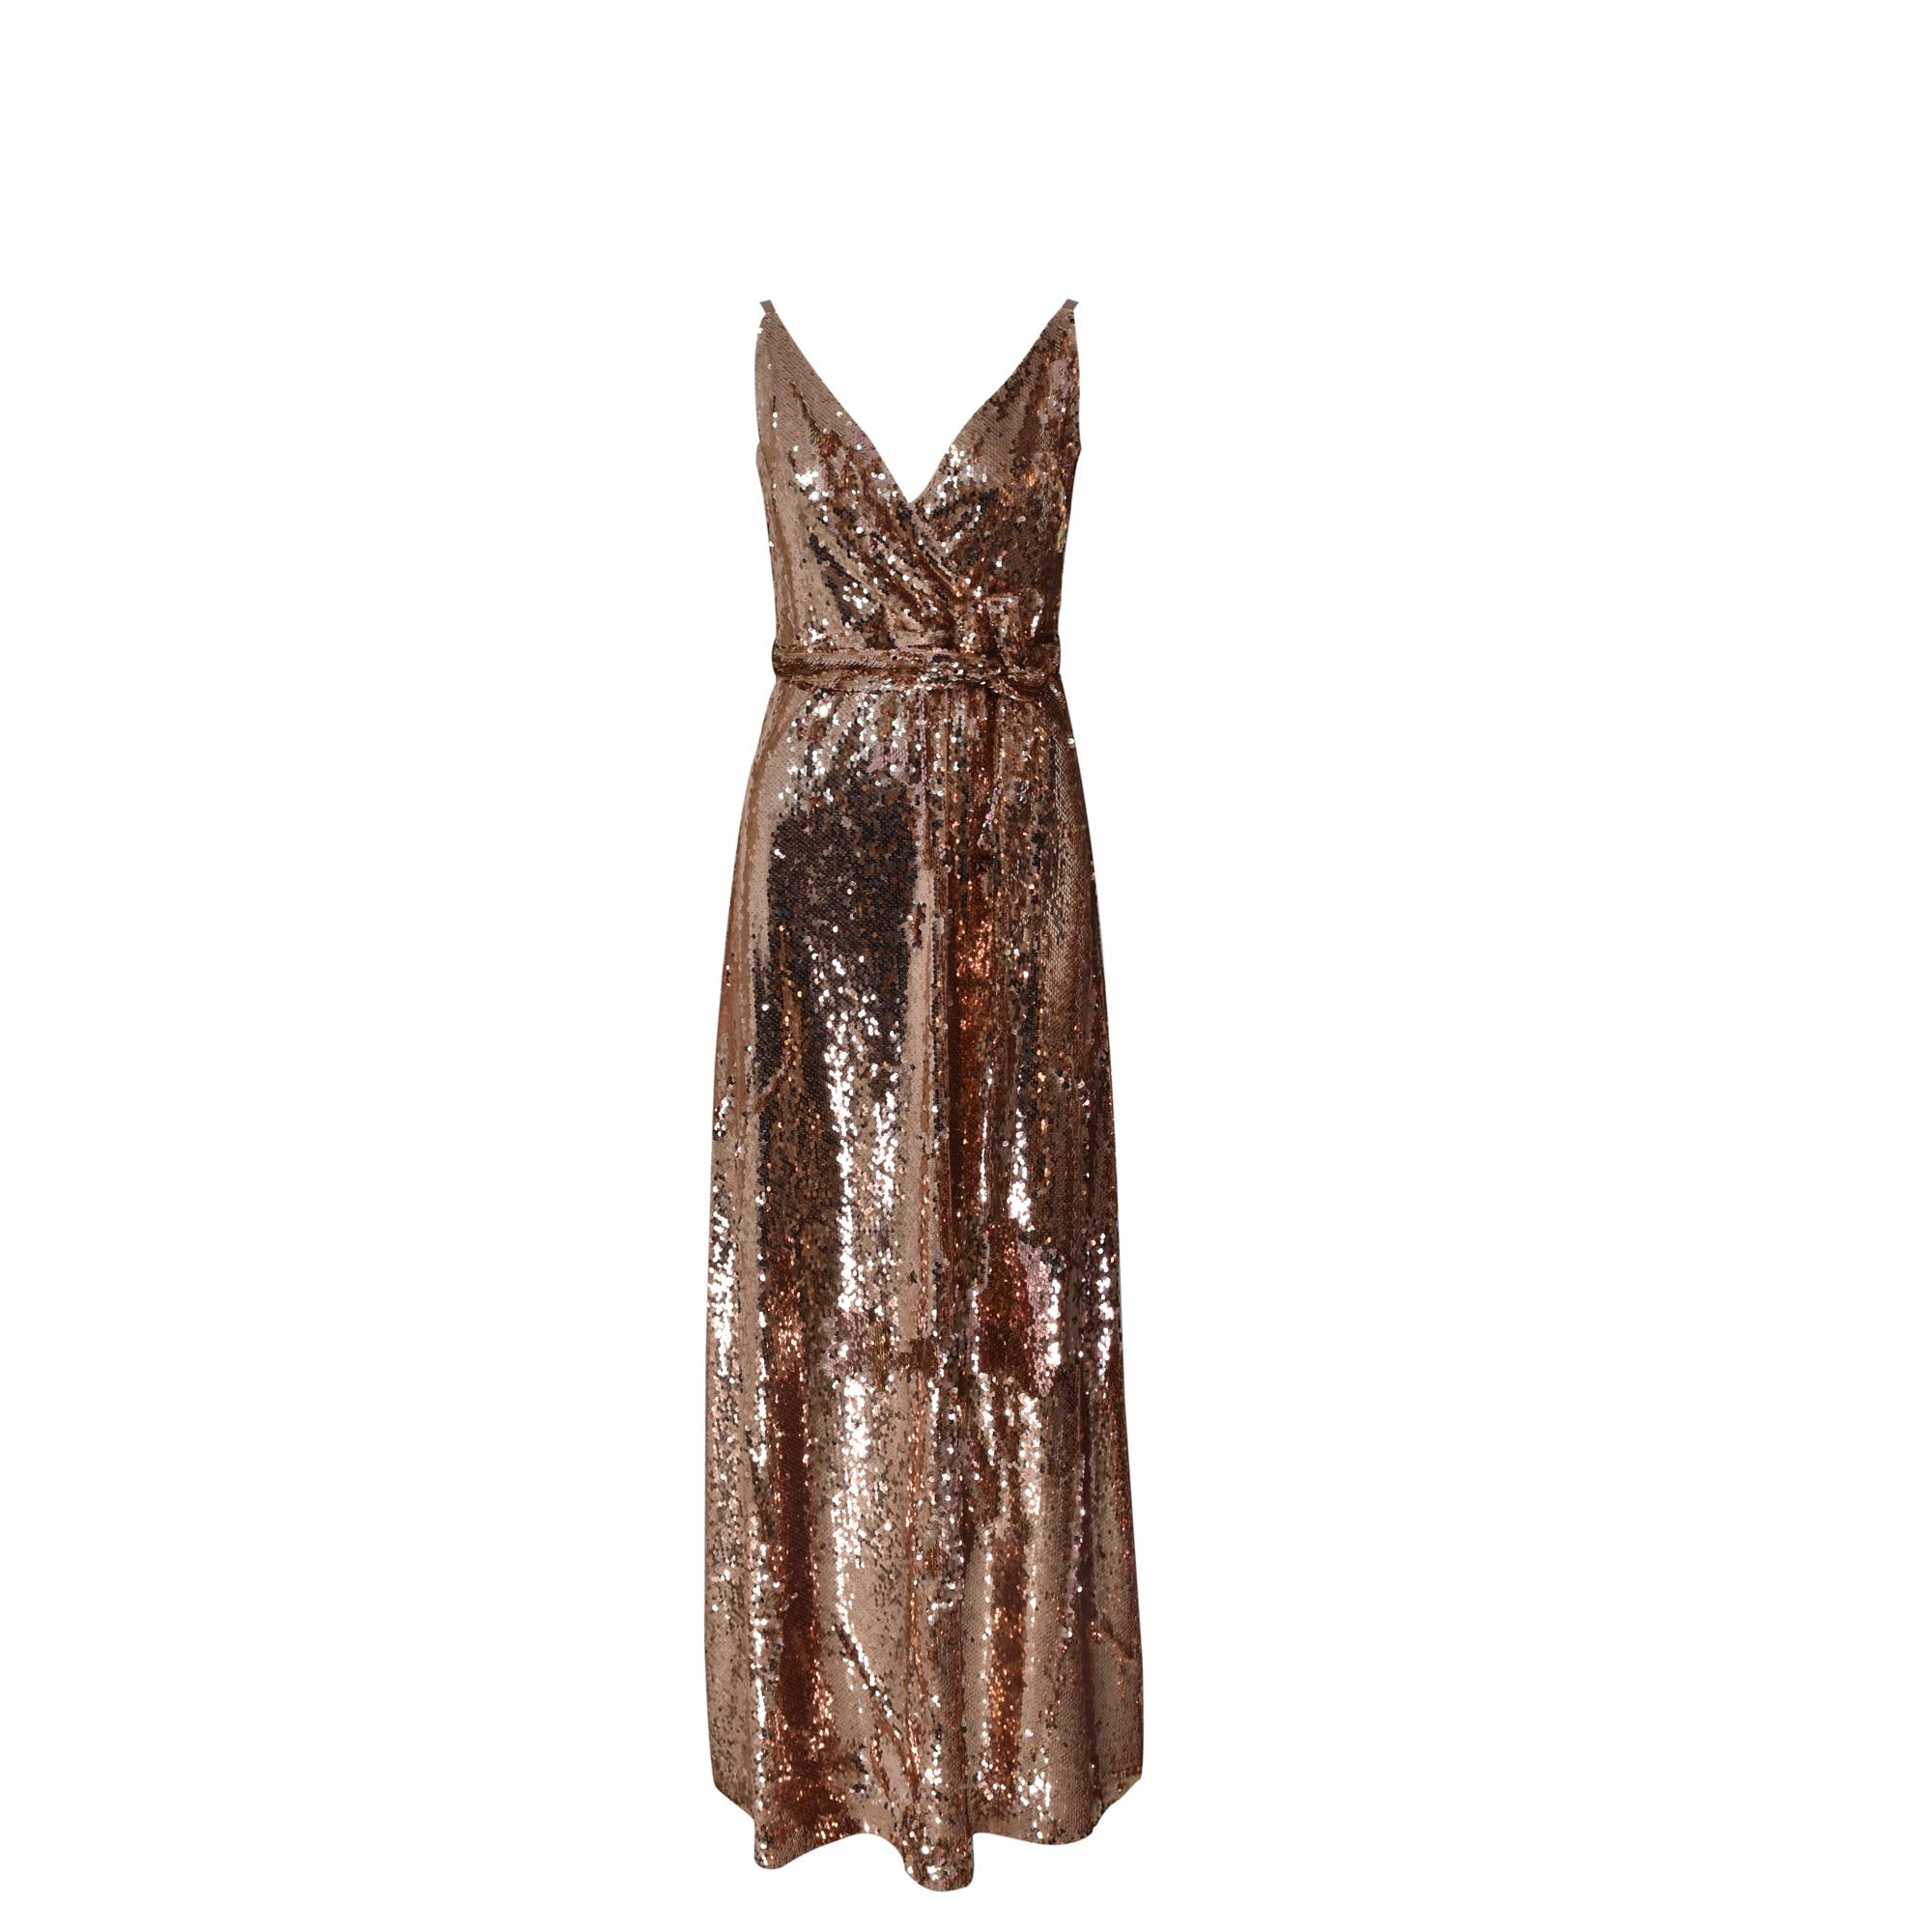 COLLECTIVA NOIR NARCISA DRESS - CNA9WA09SQ